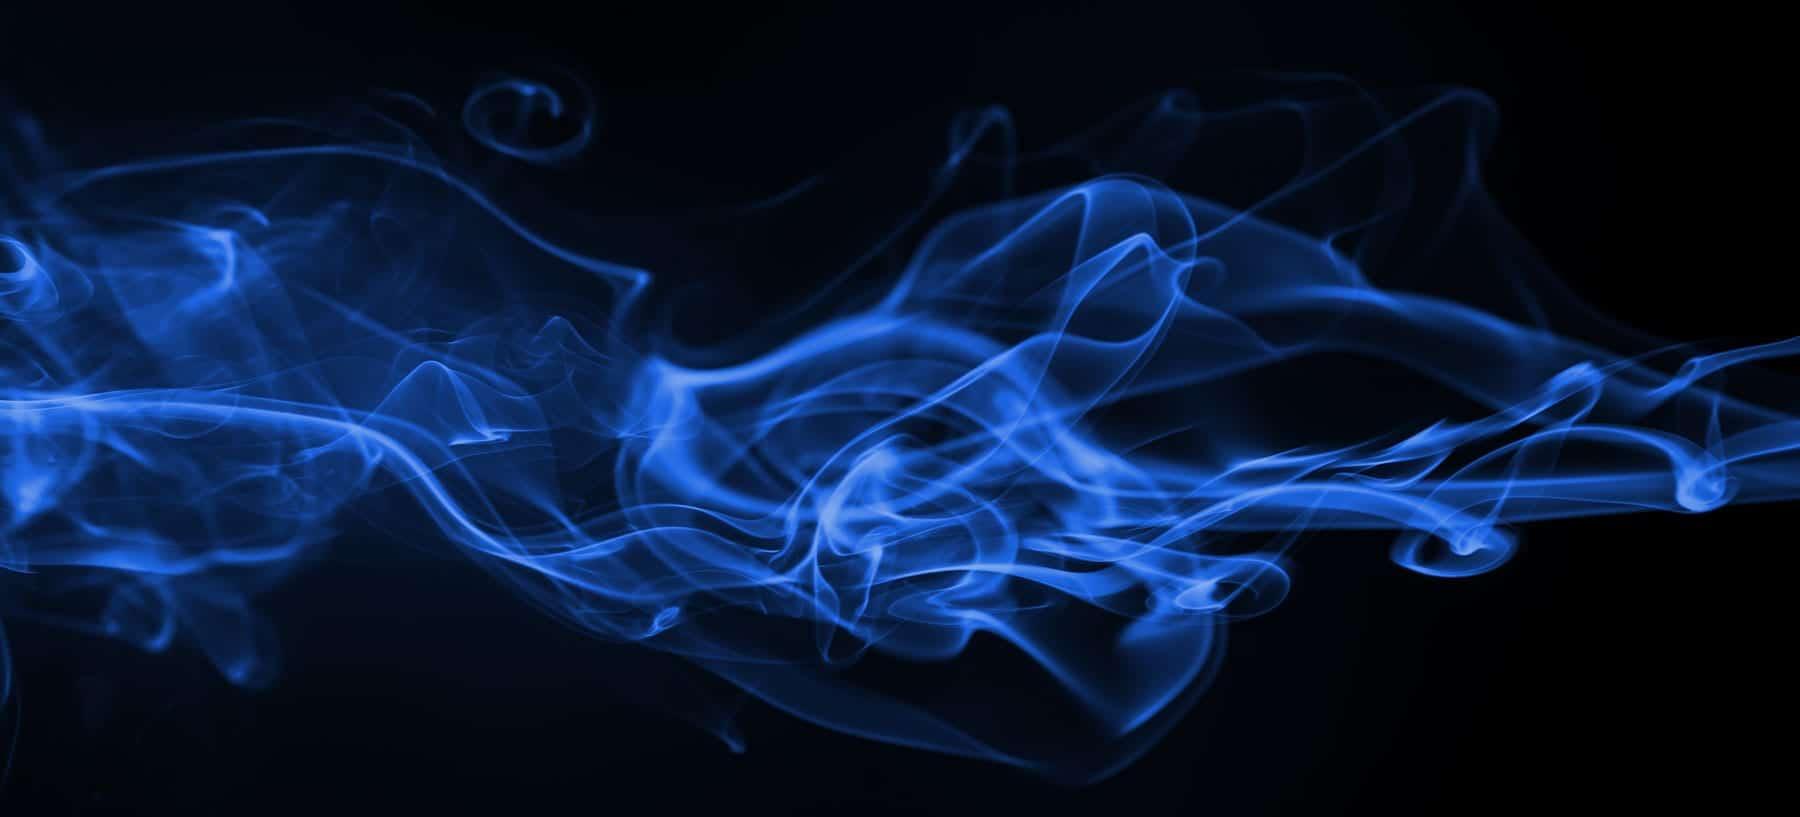 blue smoke creative services - mesquite texas